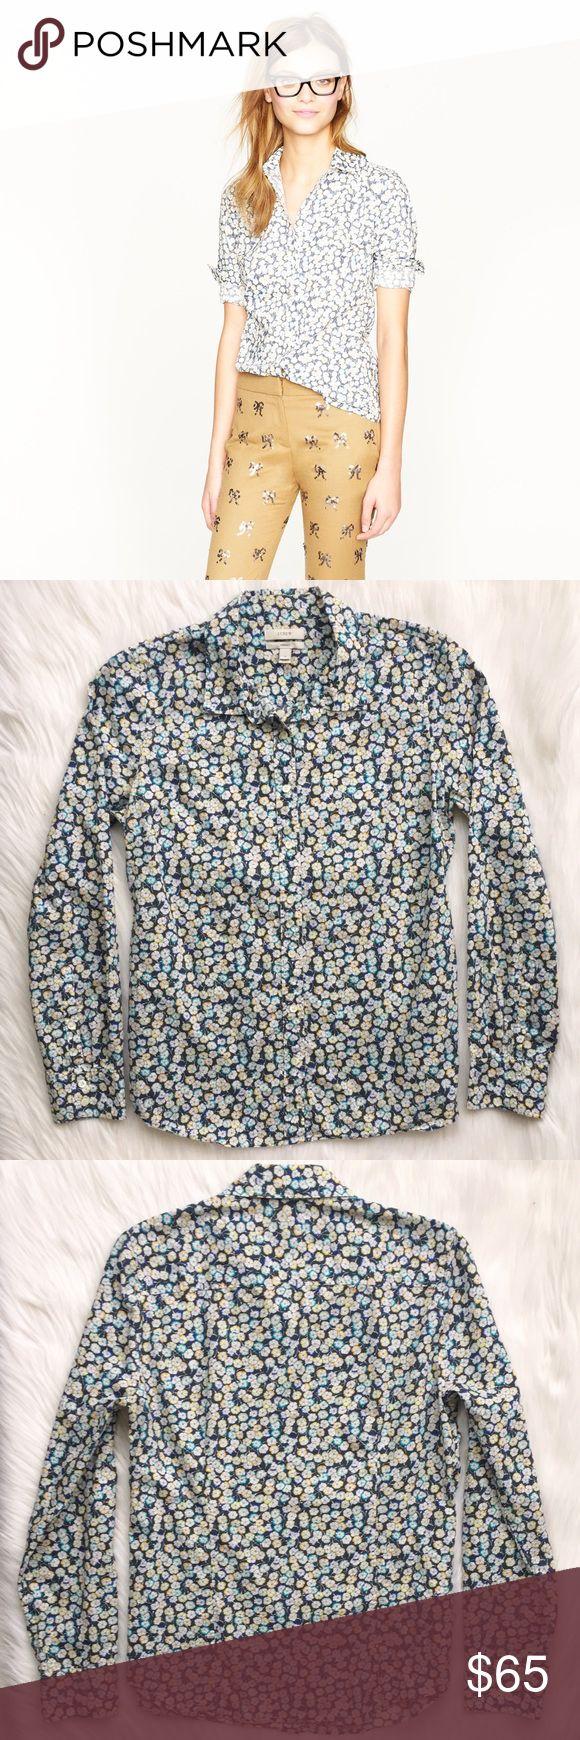 {j. crew} liberty perfect shirt in leo scarlet Washed for extra softness, this wear-anywhere blouse features the impeccable tailoring you know and love, a signature print from the archives of London's Liberty Art Fabrics (famous for florals and paisley since 1875) and precisely placed bust darts and back princess darts for a slimming, feminine, waist-defining fit.   ᴇxᴄᴇʟʟᴇɴᴛ ᴘʀᴇ-ʟᴏᴠᴇᴅ ᴄᴏɴᴅɪᴛɪᴏɴ • ɴᴏ sɪɢɴs ᴏғ ᴡᴇᴀʀ ᴍsʀᴘ • $150 ᴍᴀᴛᴇʀɪᴀʟs • 100% Cotton sᴛʏʟᴇ • 97120  ᴍᴇᴀsᴜʀᴇᴍᴇɴᴛs • ғʟᴀᴛ ʟᴇɴɢᴛʜ…